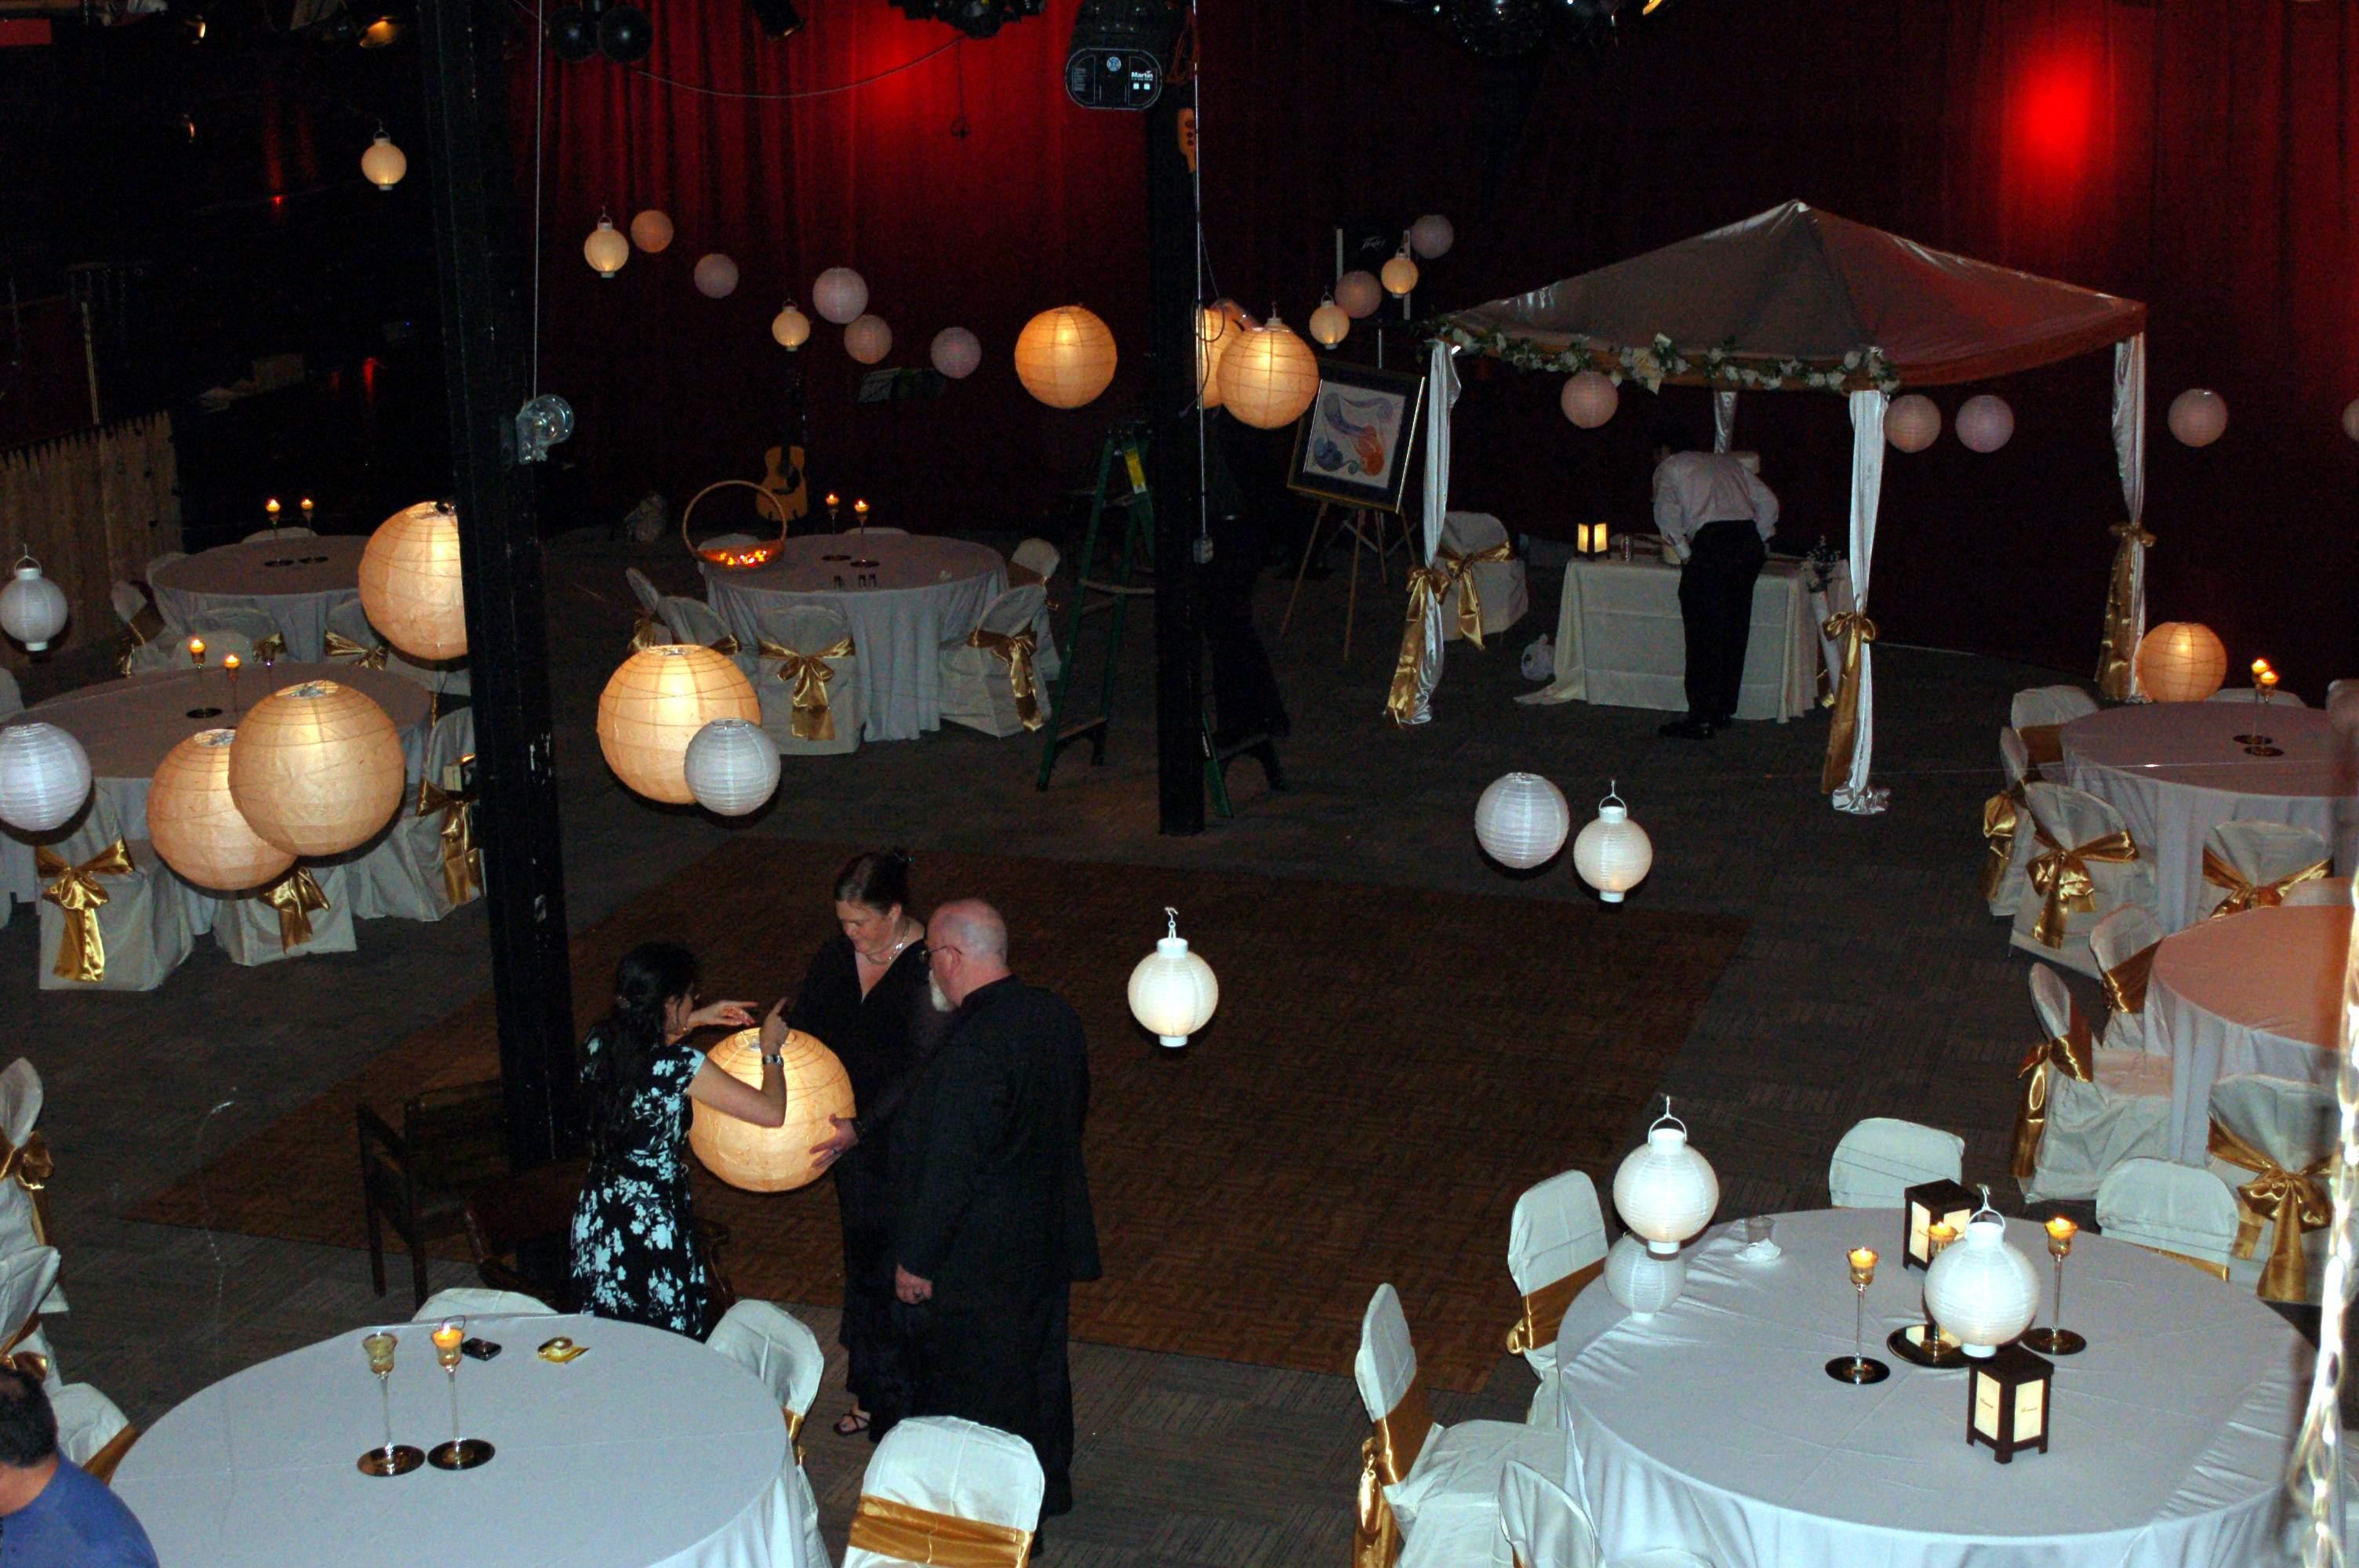 DIY, Reception, Flowers & Decor, pink, Music, Spotlight, Uplighting, Paper lantern